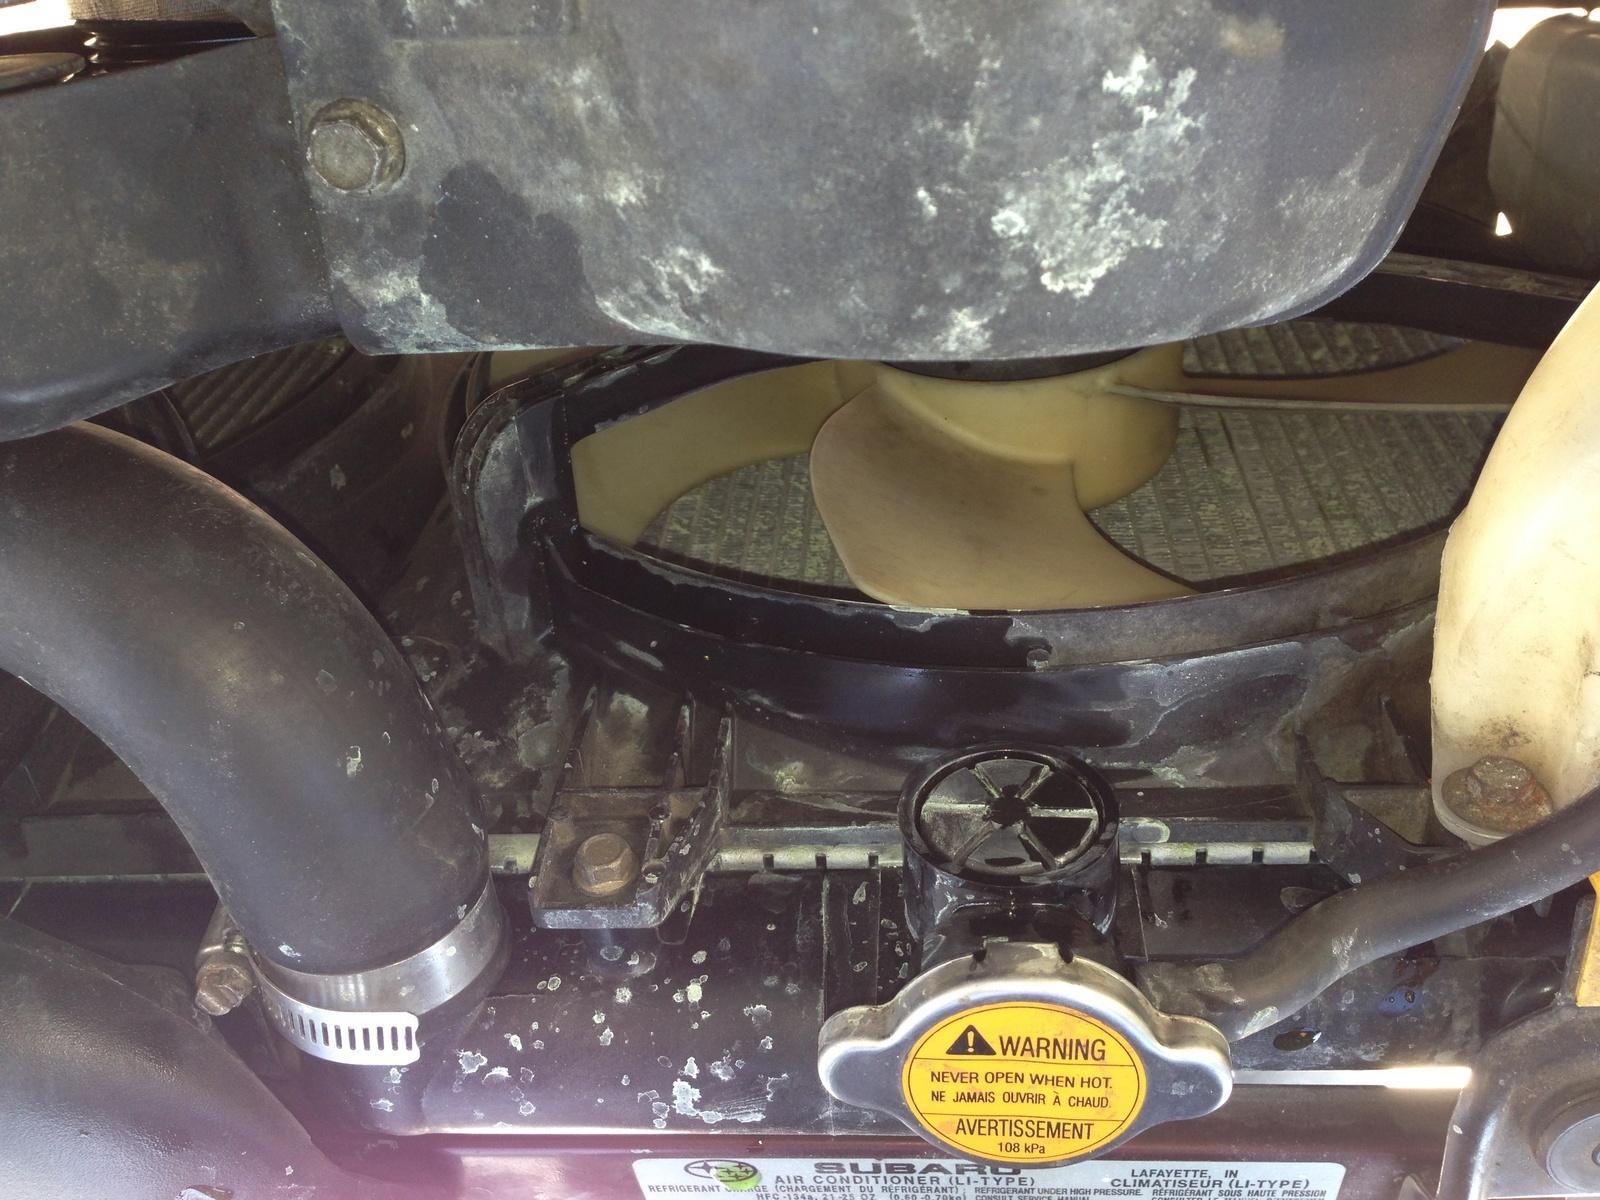 Subaru Outback Questions - Leaking coolant - CarGurus